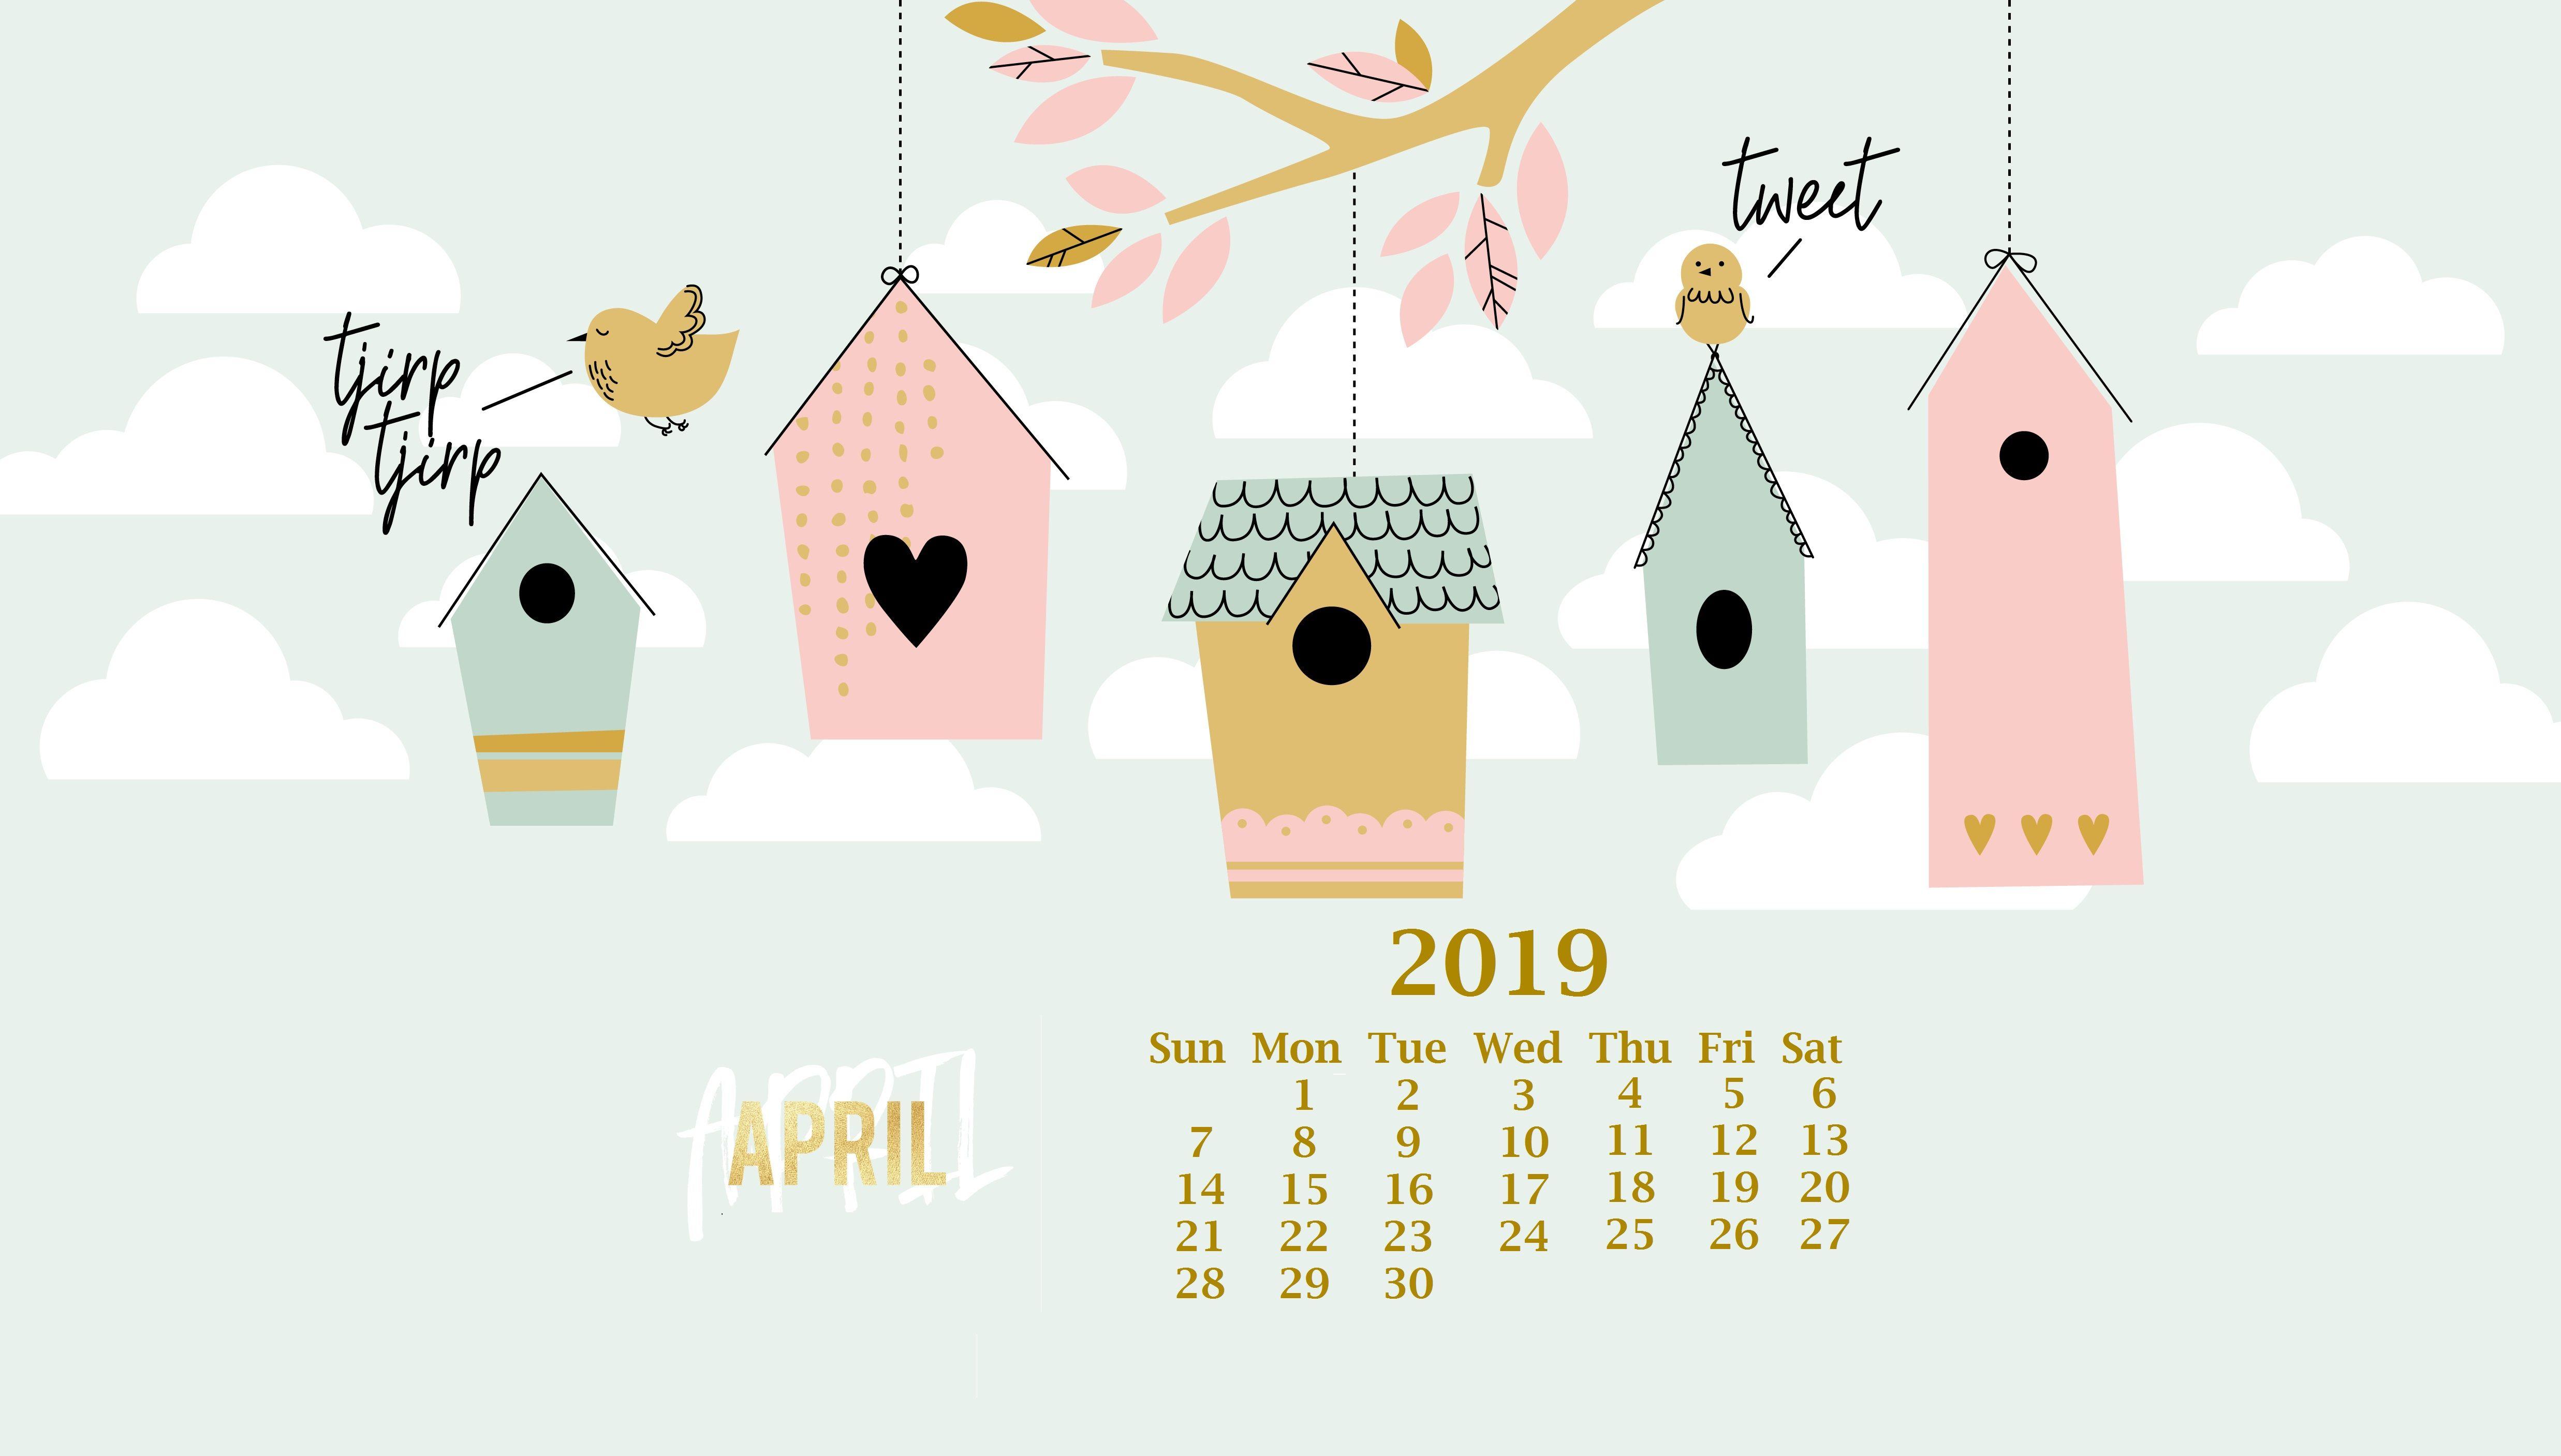 Cute April 2019 Calendar Wallpaper.